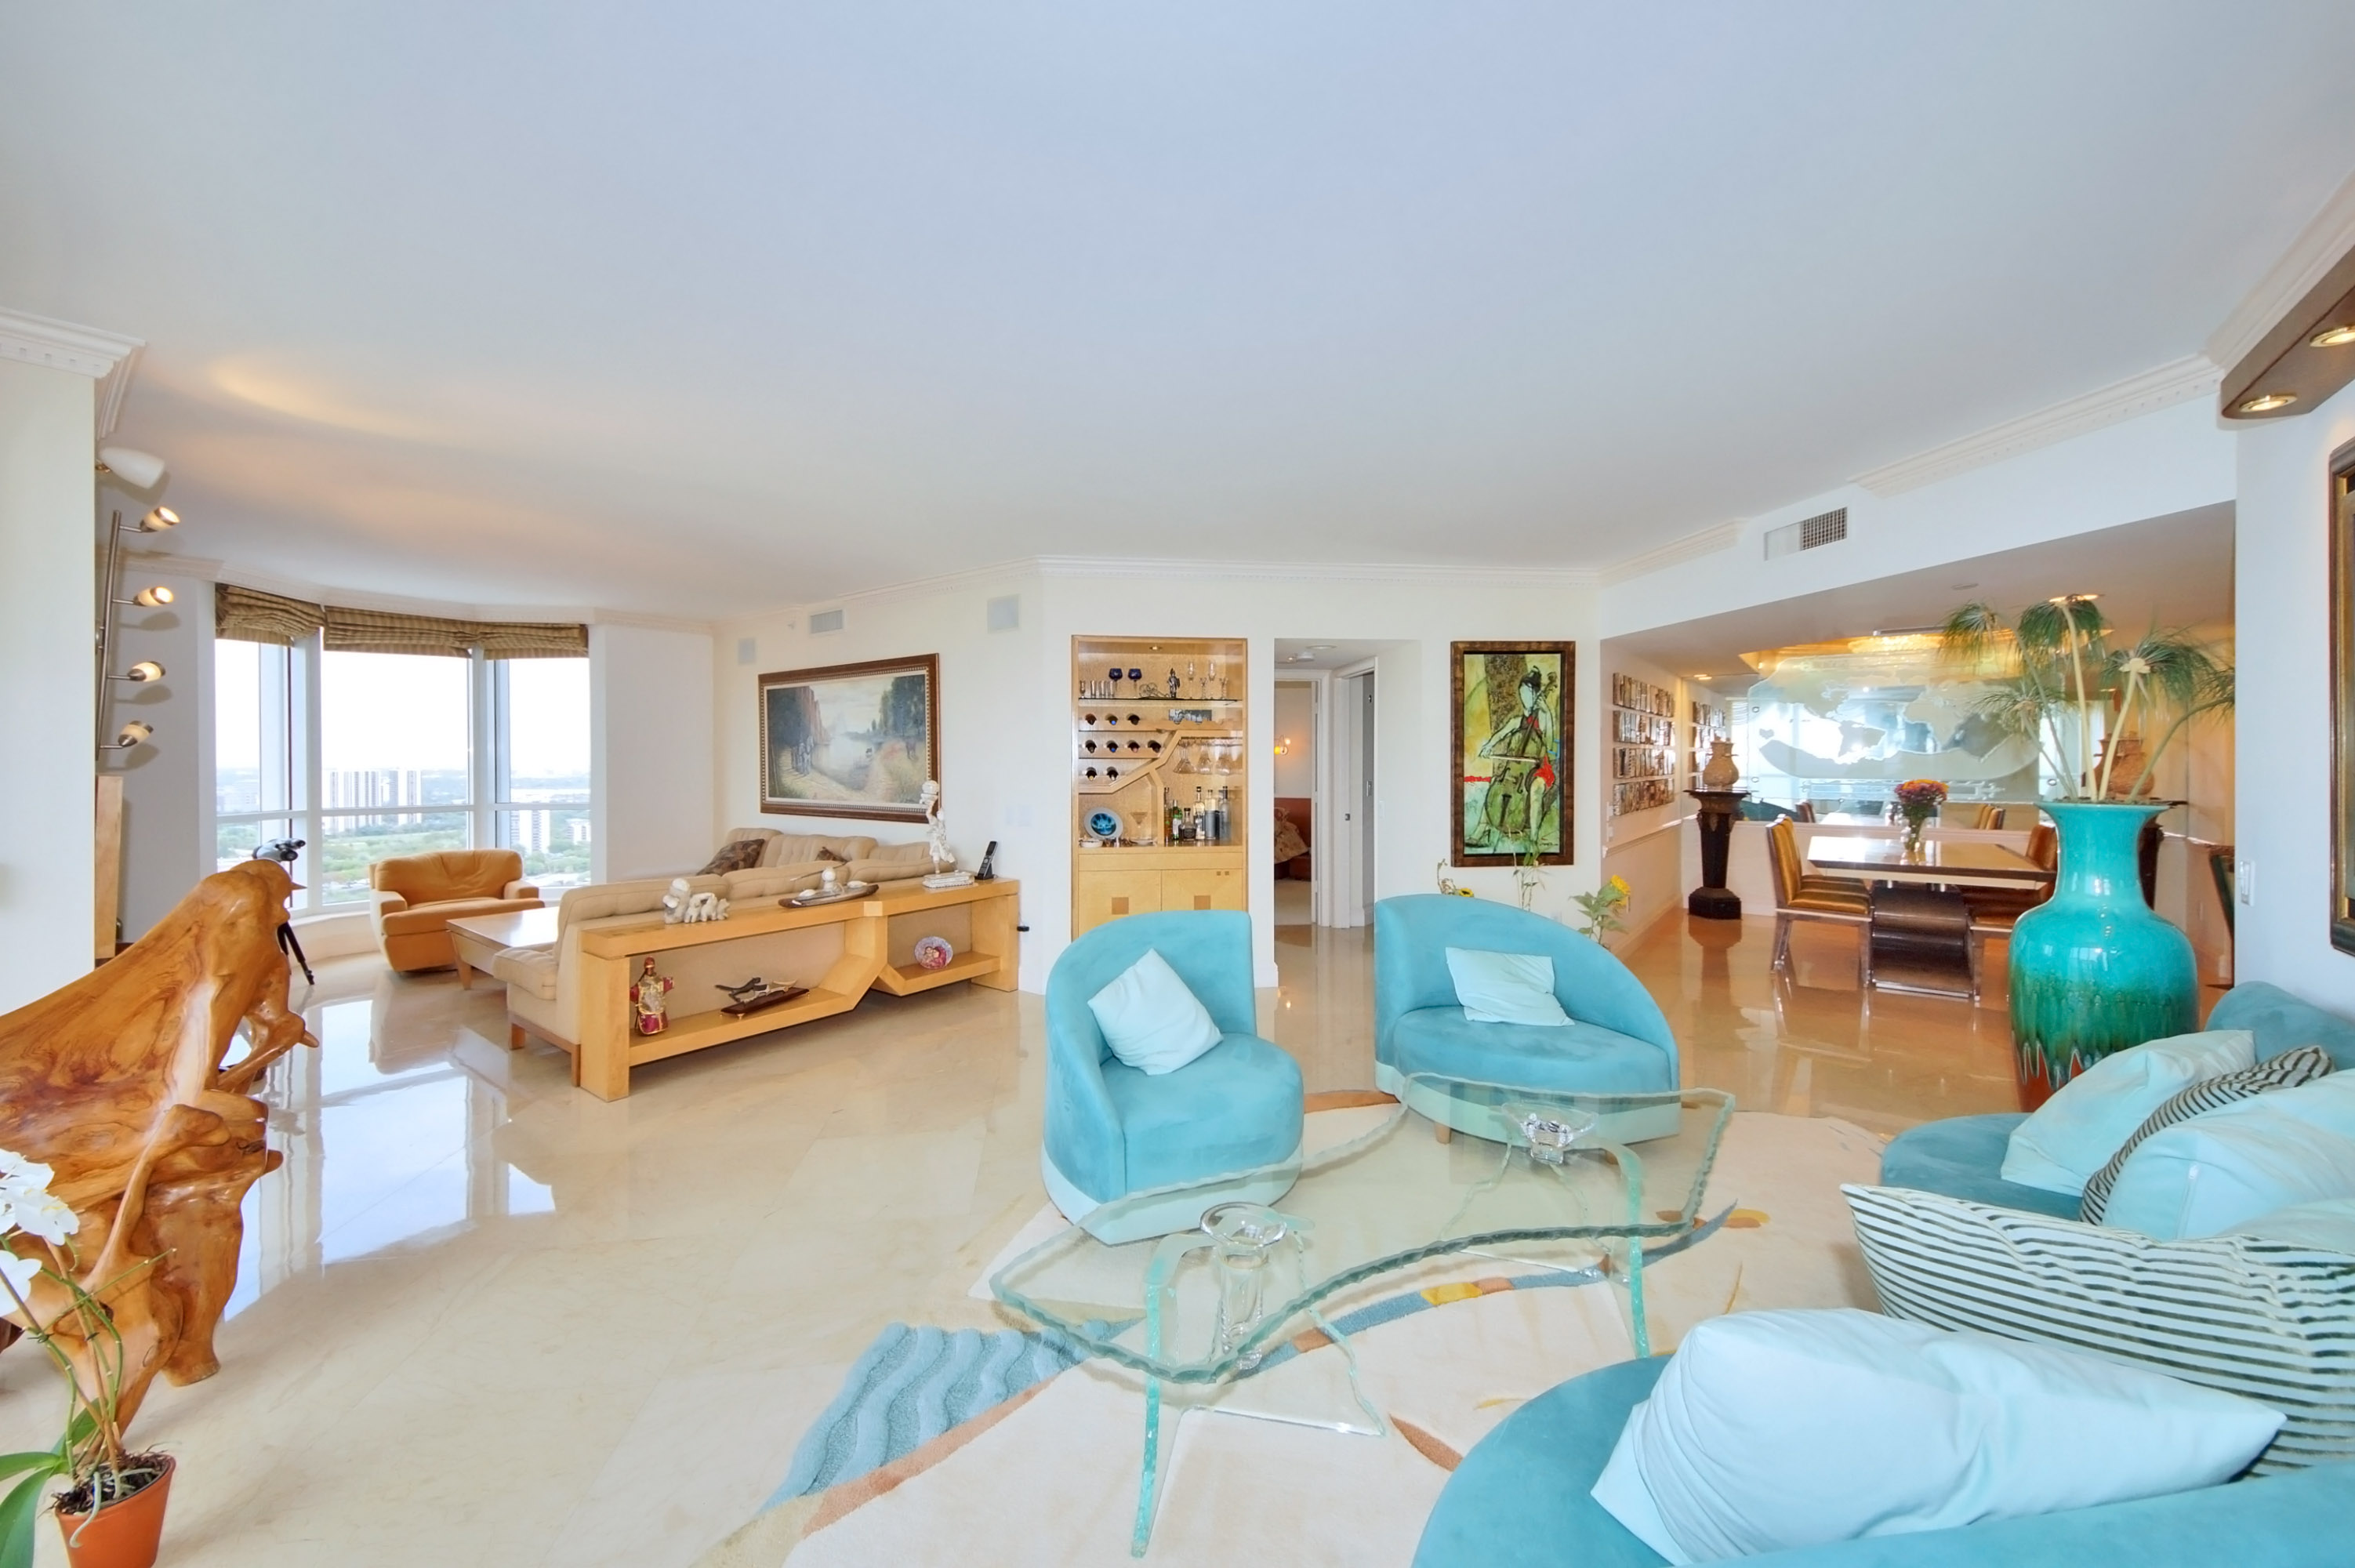 Condomínio para Venda às 21055 Yacht Club #3109 21055 Yacht Club 3109 Aventura, Florida, 33180 Estados Unidos